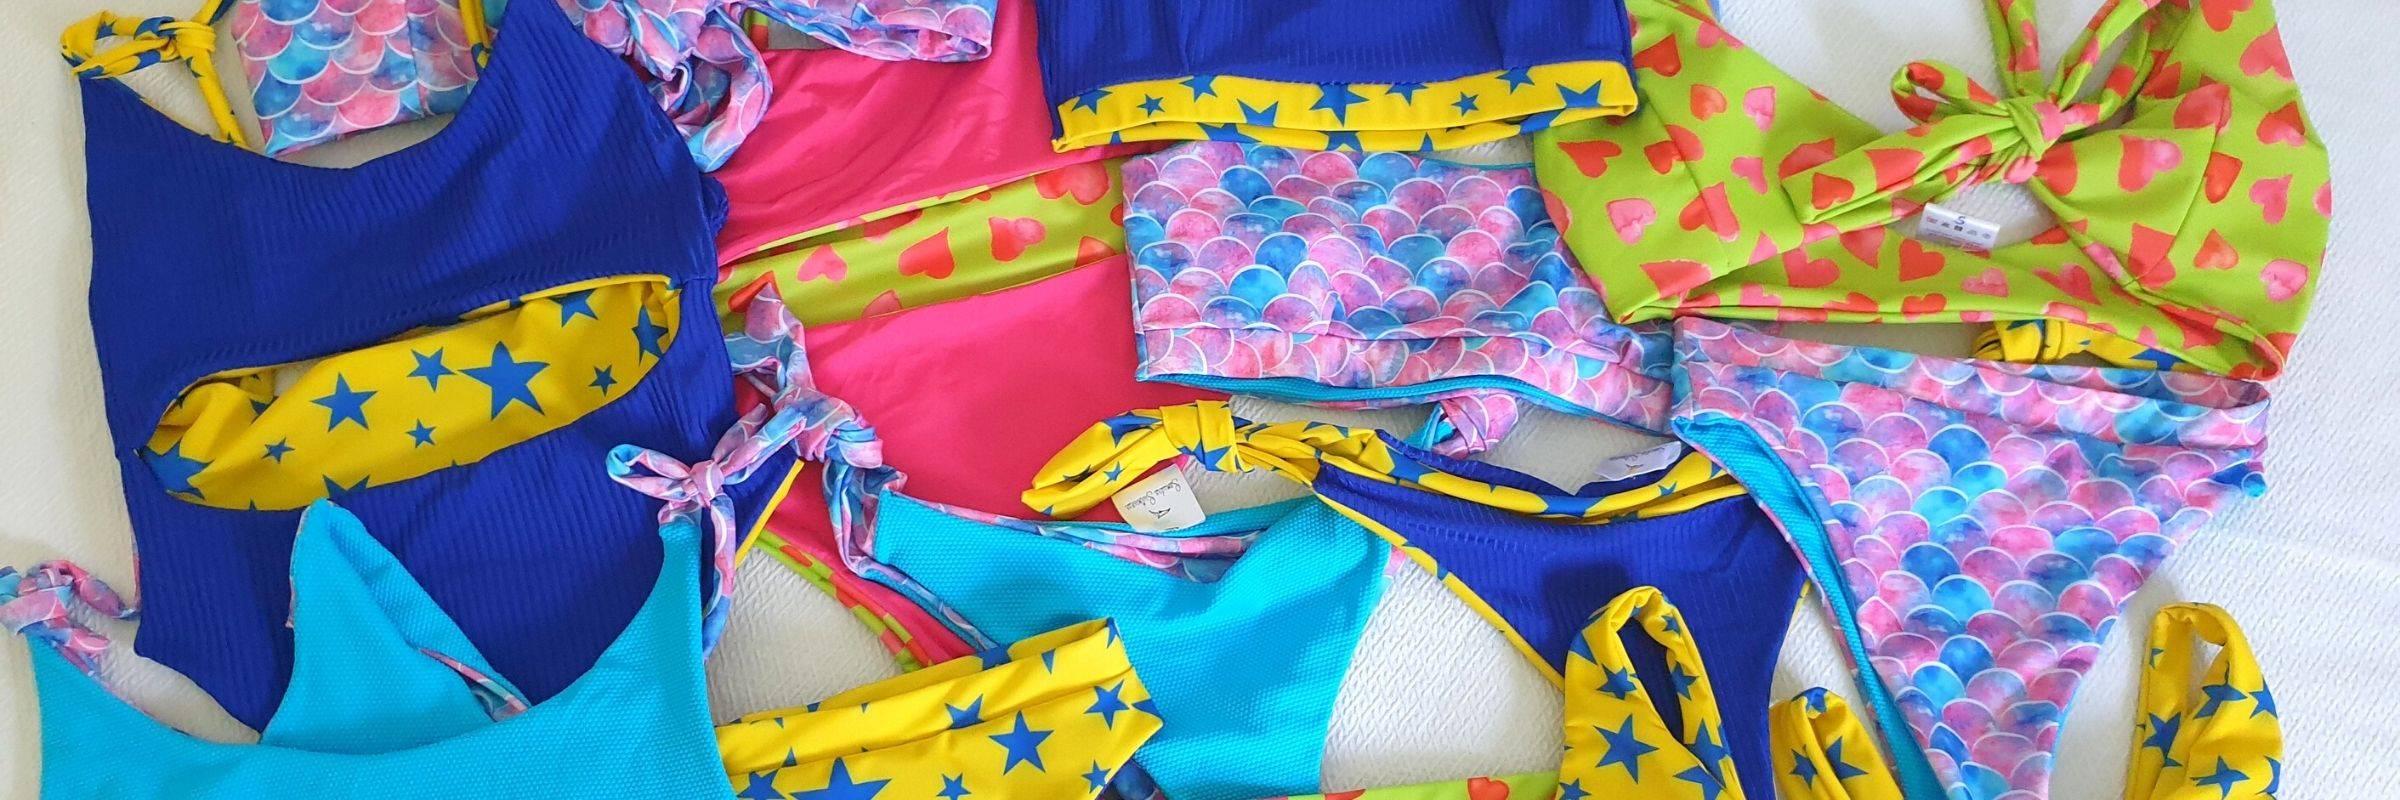 Sustainable swimwear from Samudra swimwear, colorful spanish swimwear pieces made out of Econyl